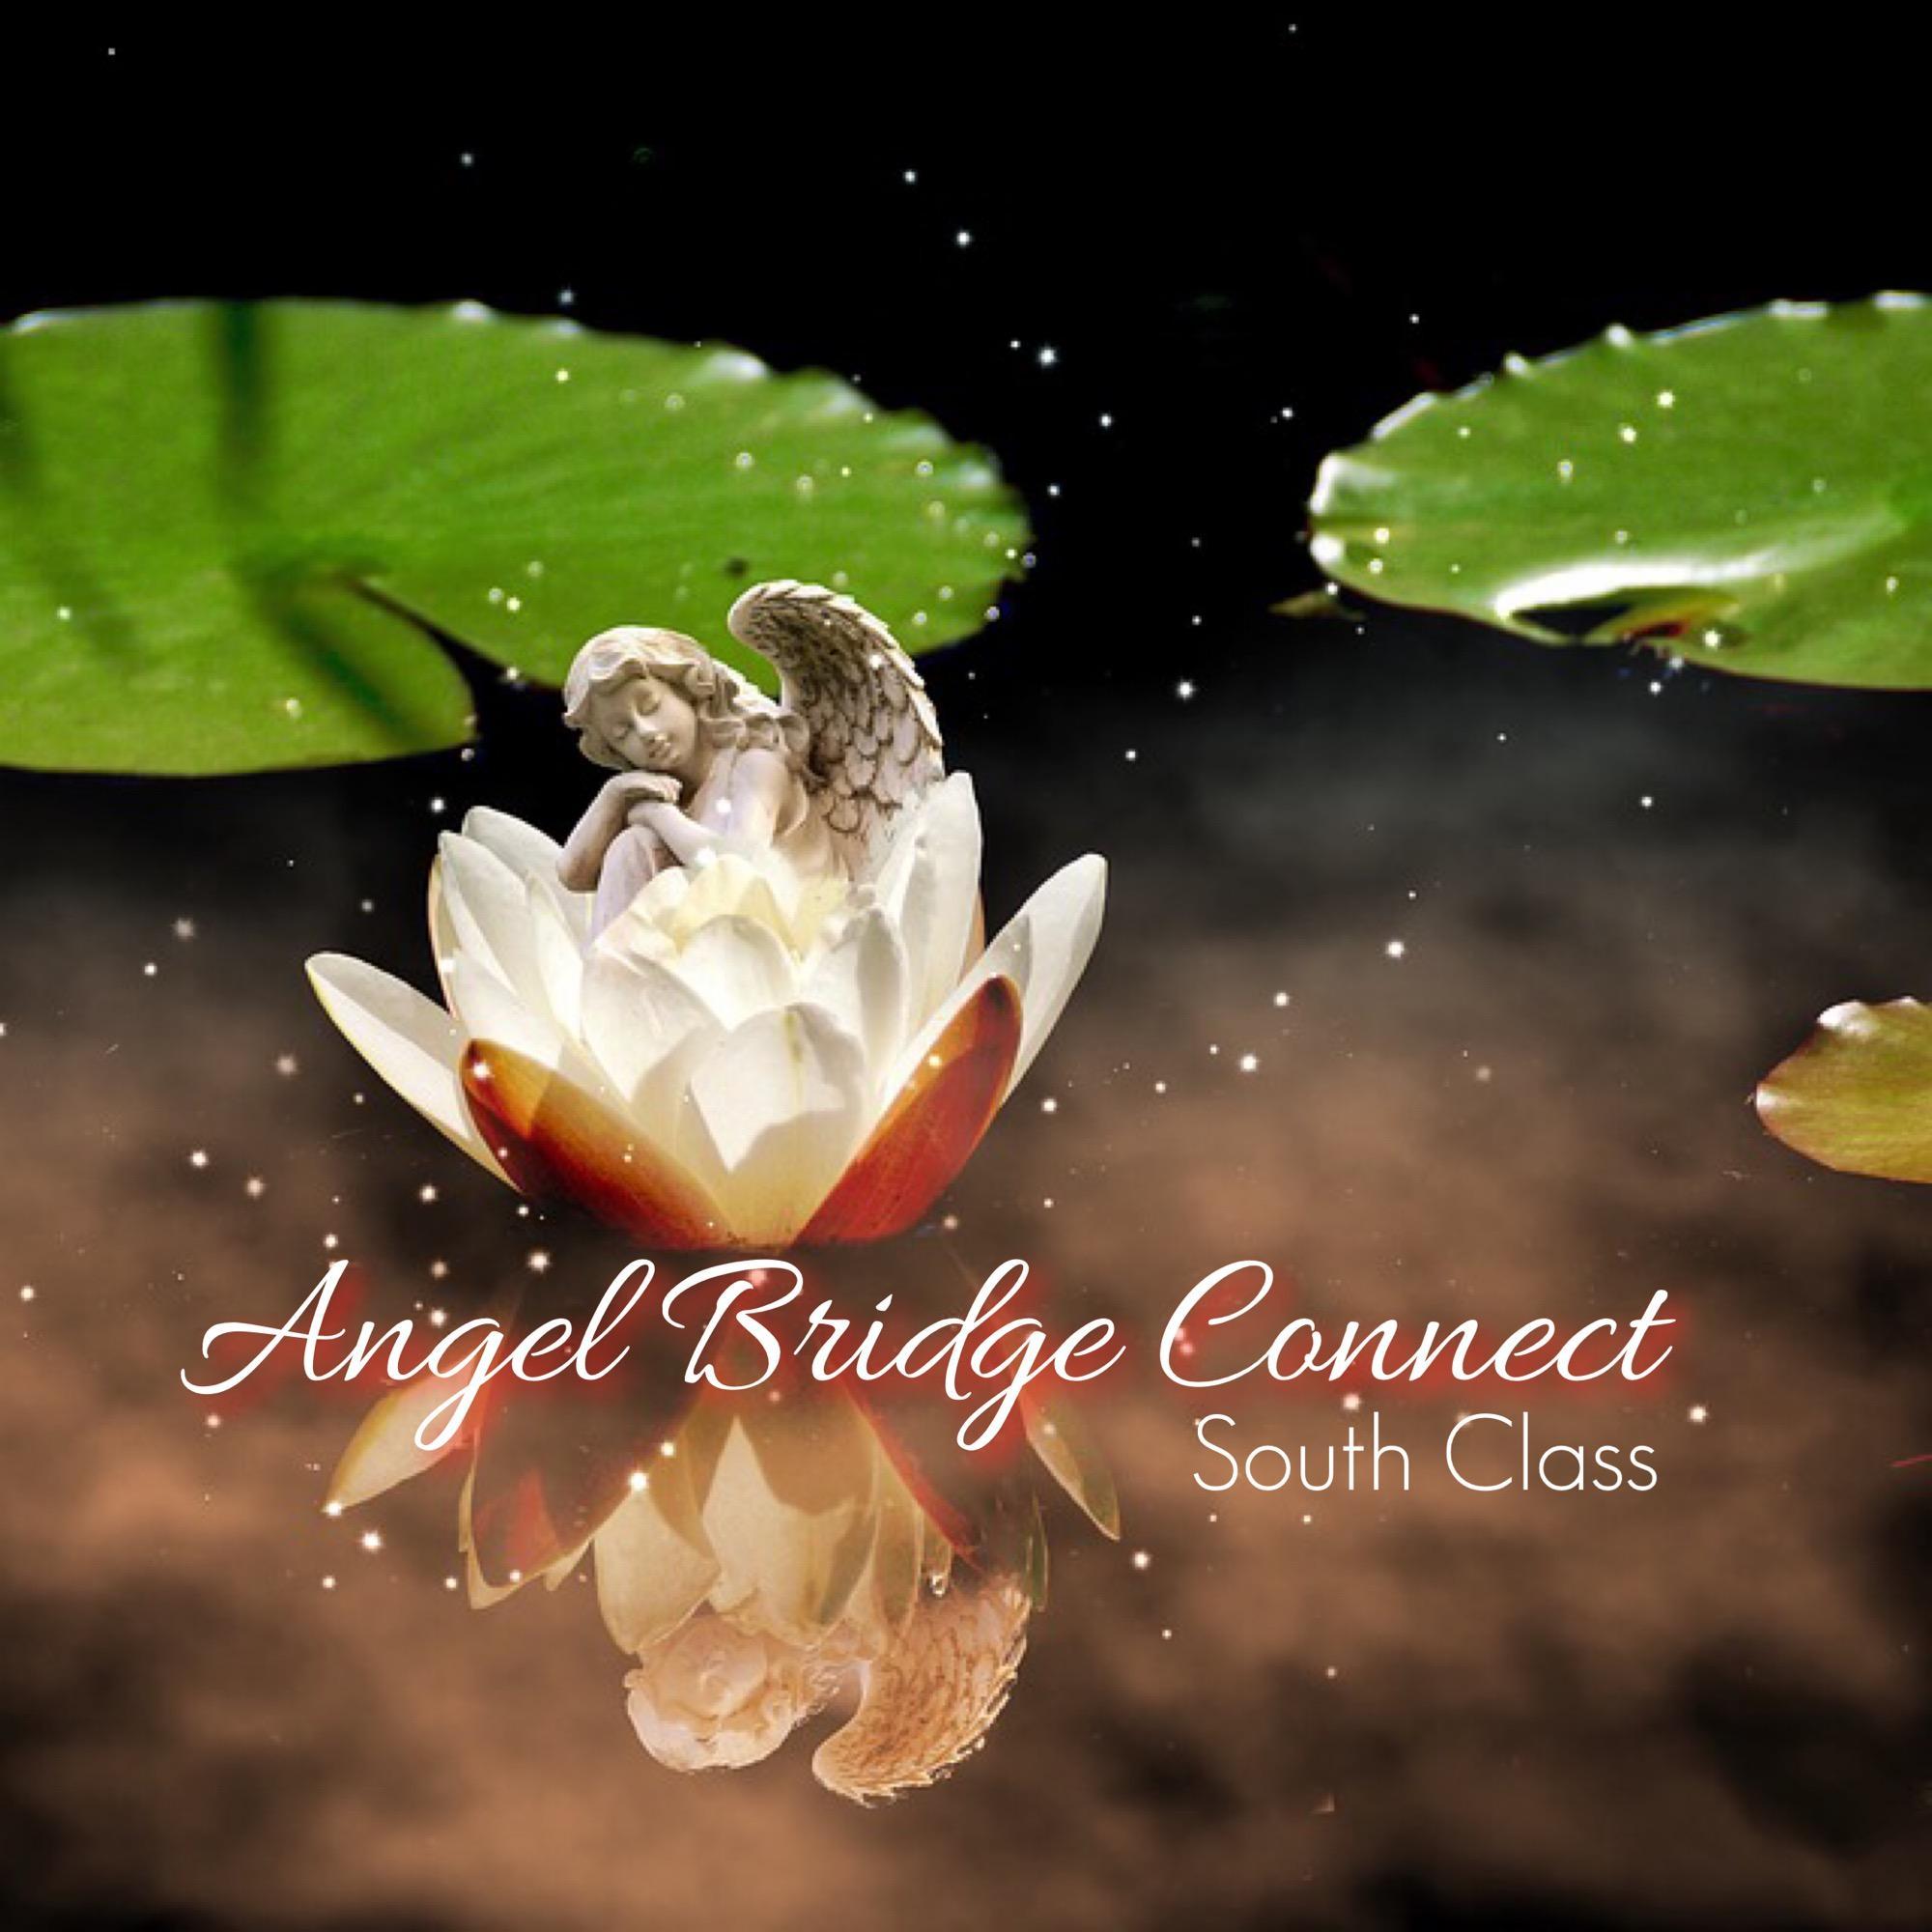 Angel Bridge Connect South Class